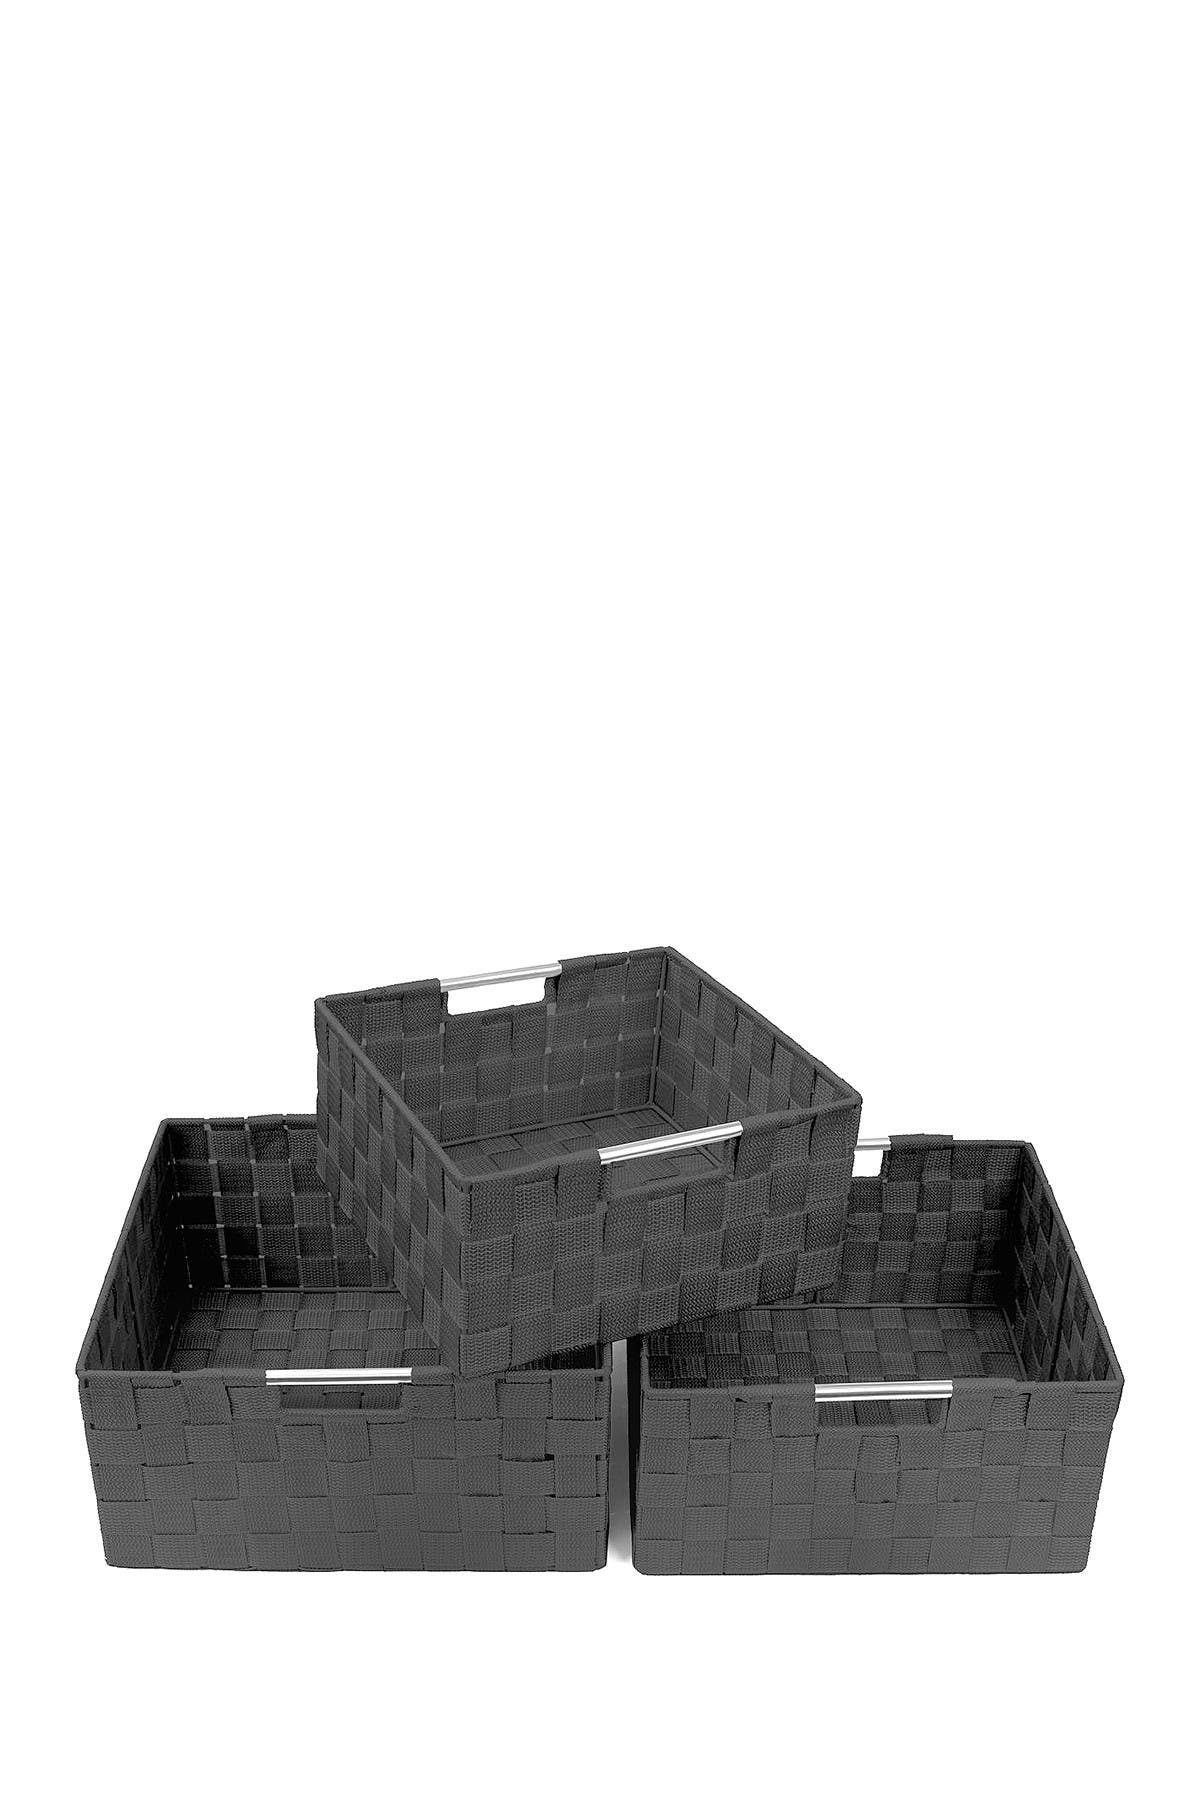 Image of Sorbus Gray Woven 3-Piece Basket Set